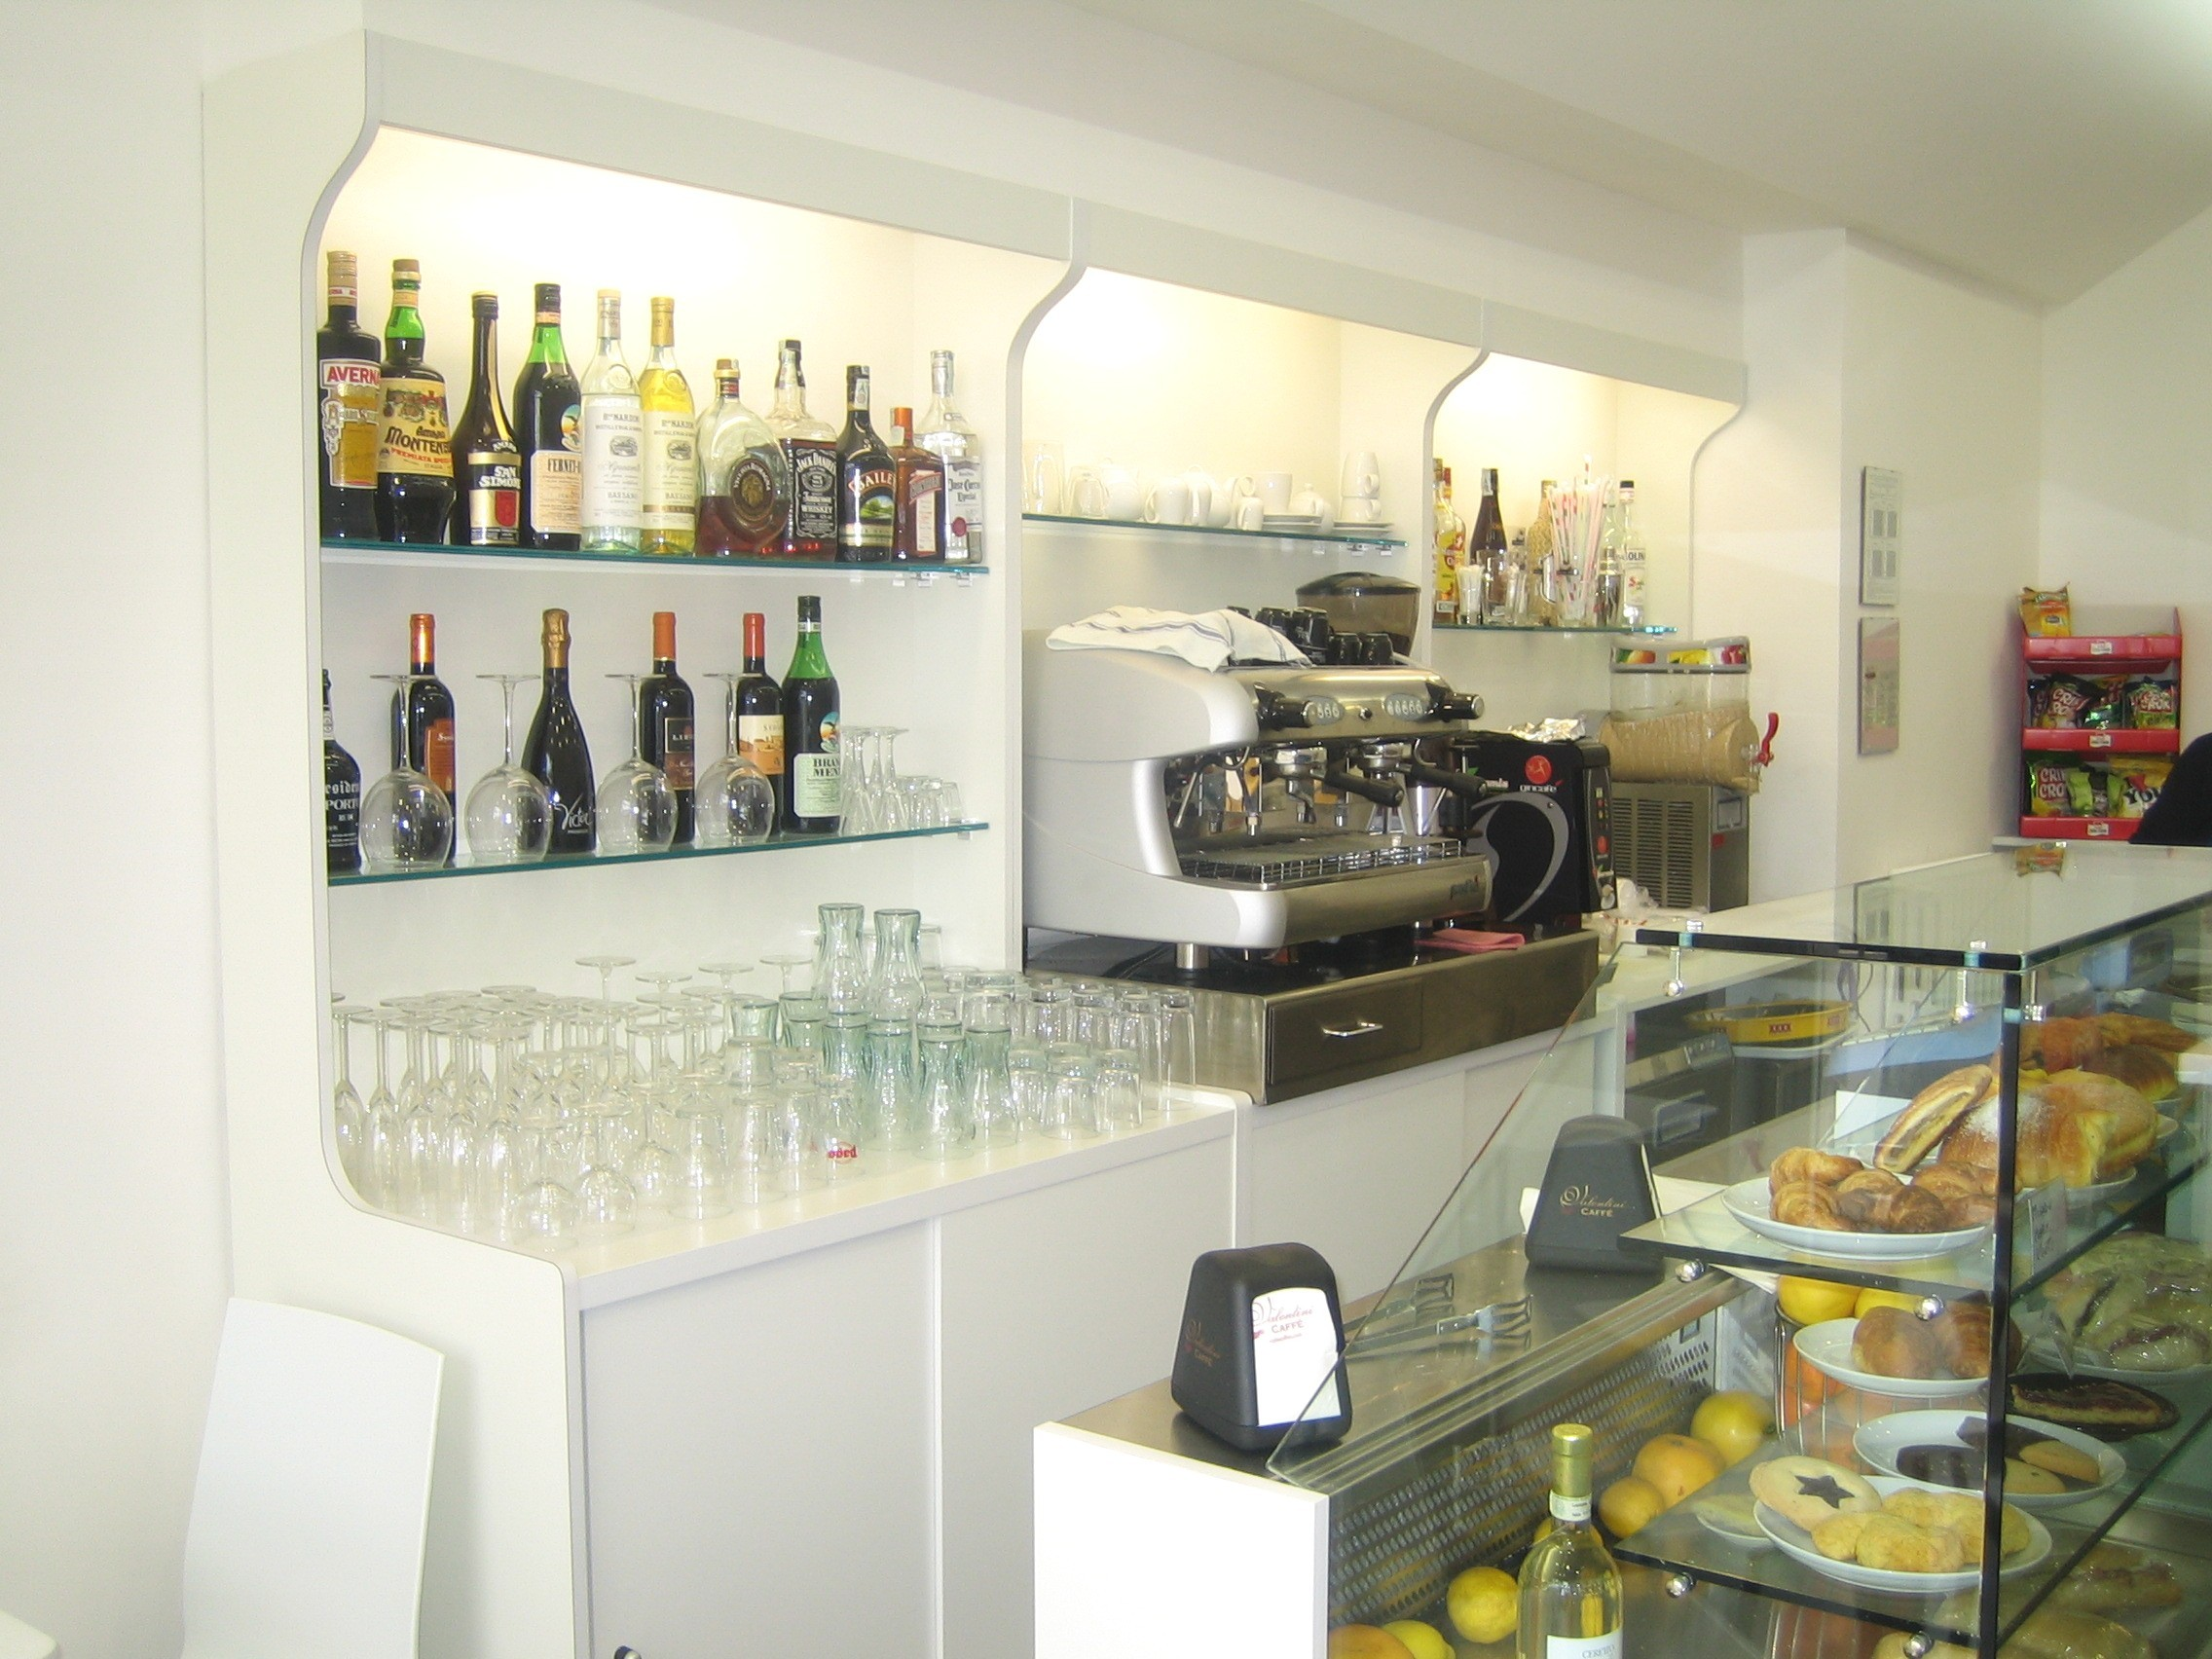 Banchi bar produttori banchi bar grezzi e rivestiti for Arredamento bar moderno prezzi